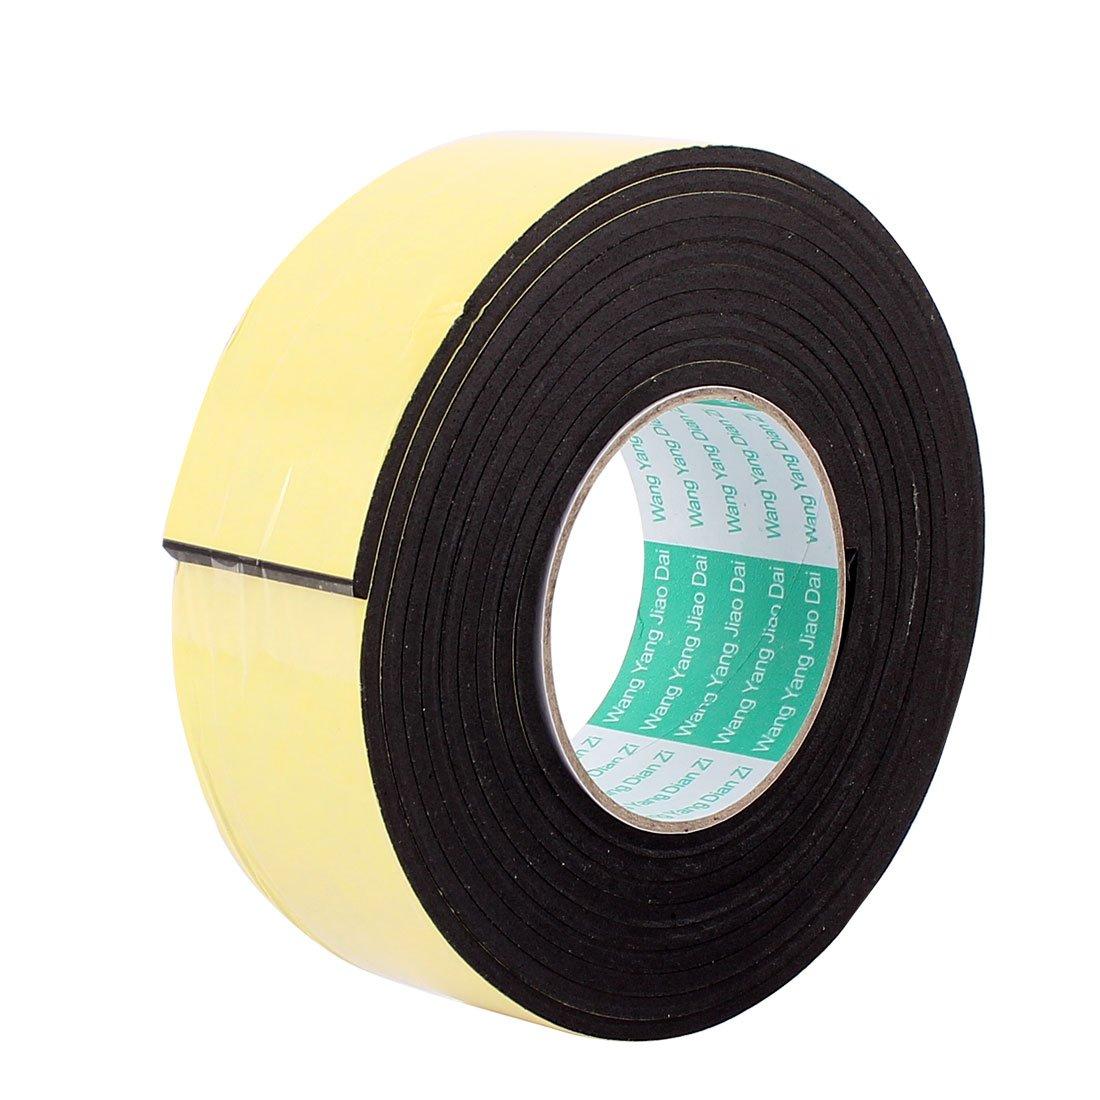 Uxcell a16070100ux0585 Single Sided Sponge Tape Adhesive Sticker Foam Glue Strip Sealing, 50 mm x 4 mm, 10' 10'